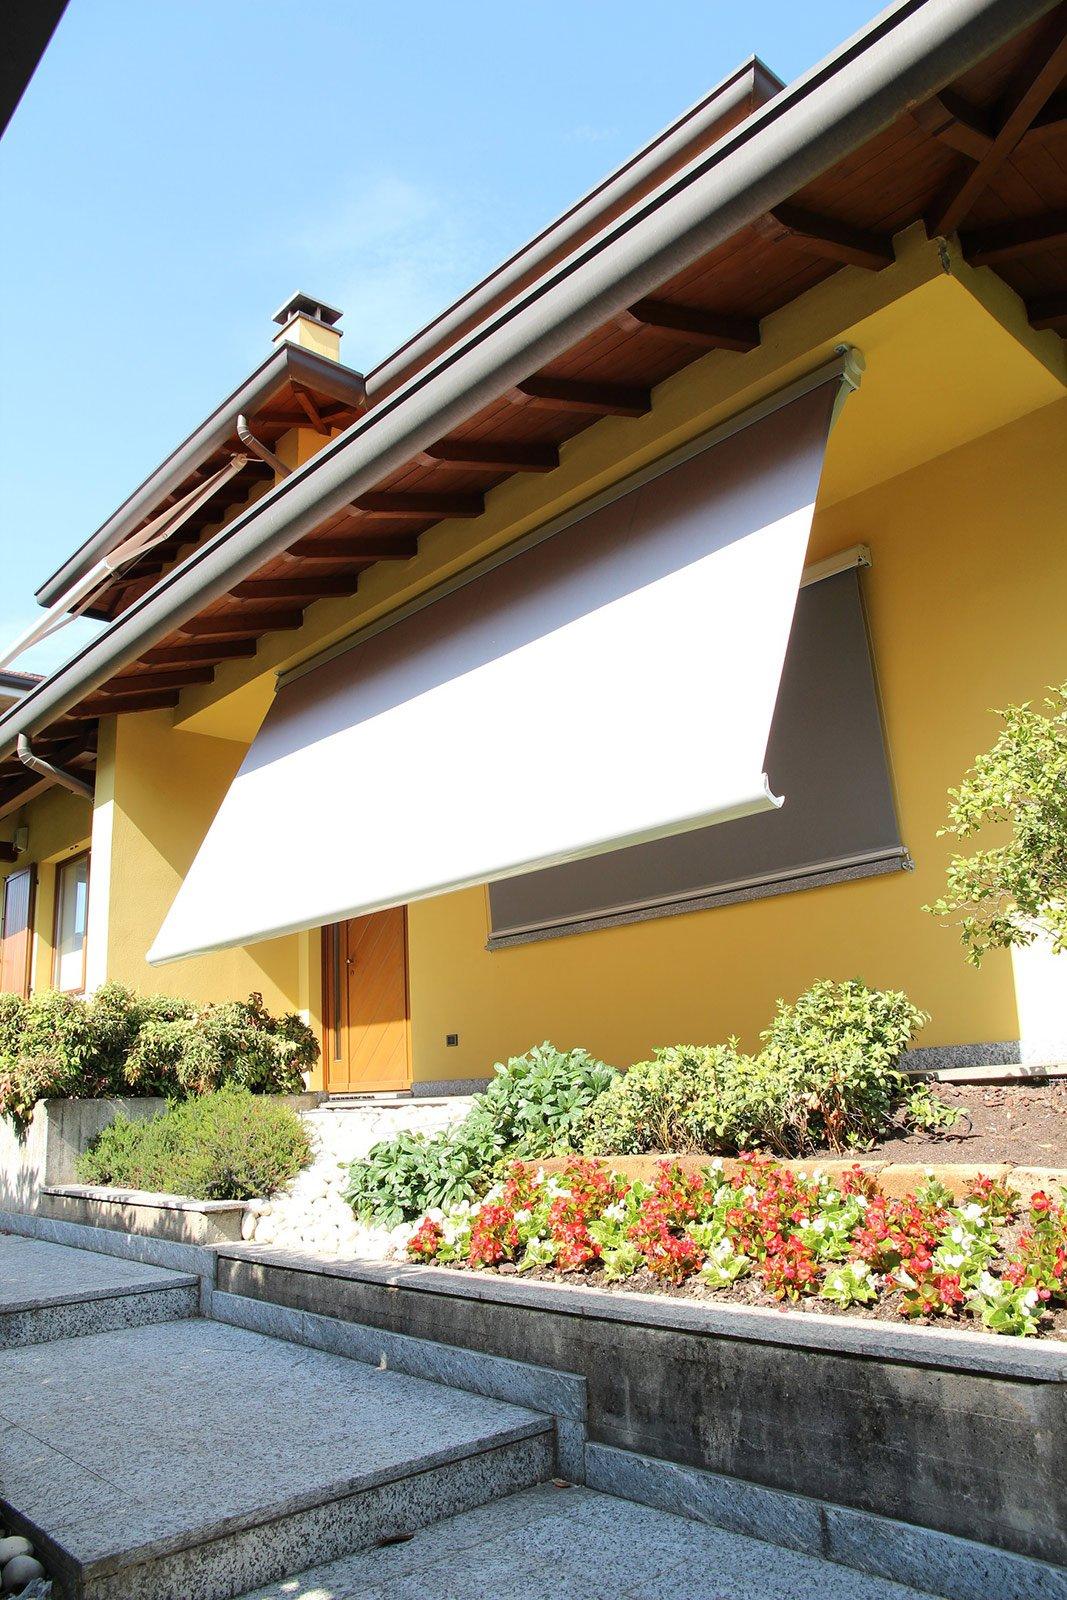 Tende da sole per terrazzo o giardino cose di casa - Tende da sole ikea ...